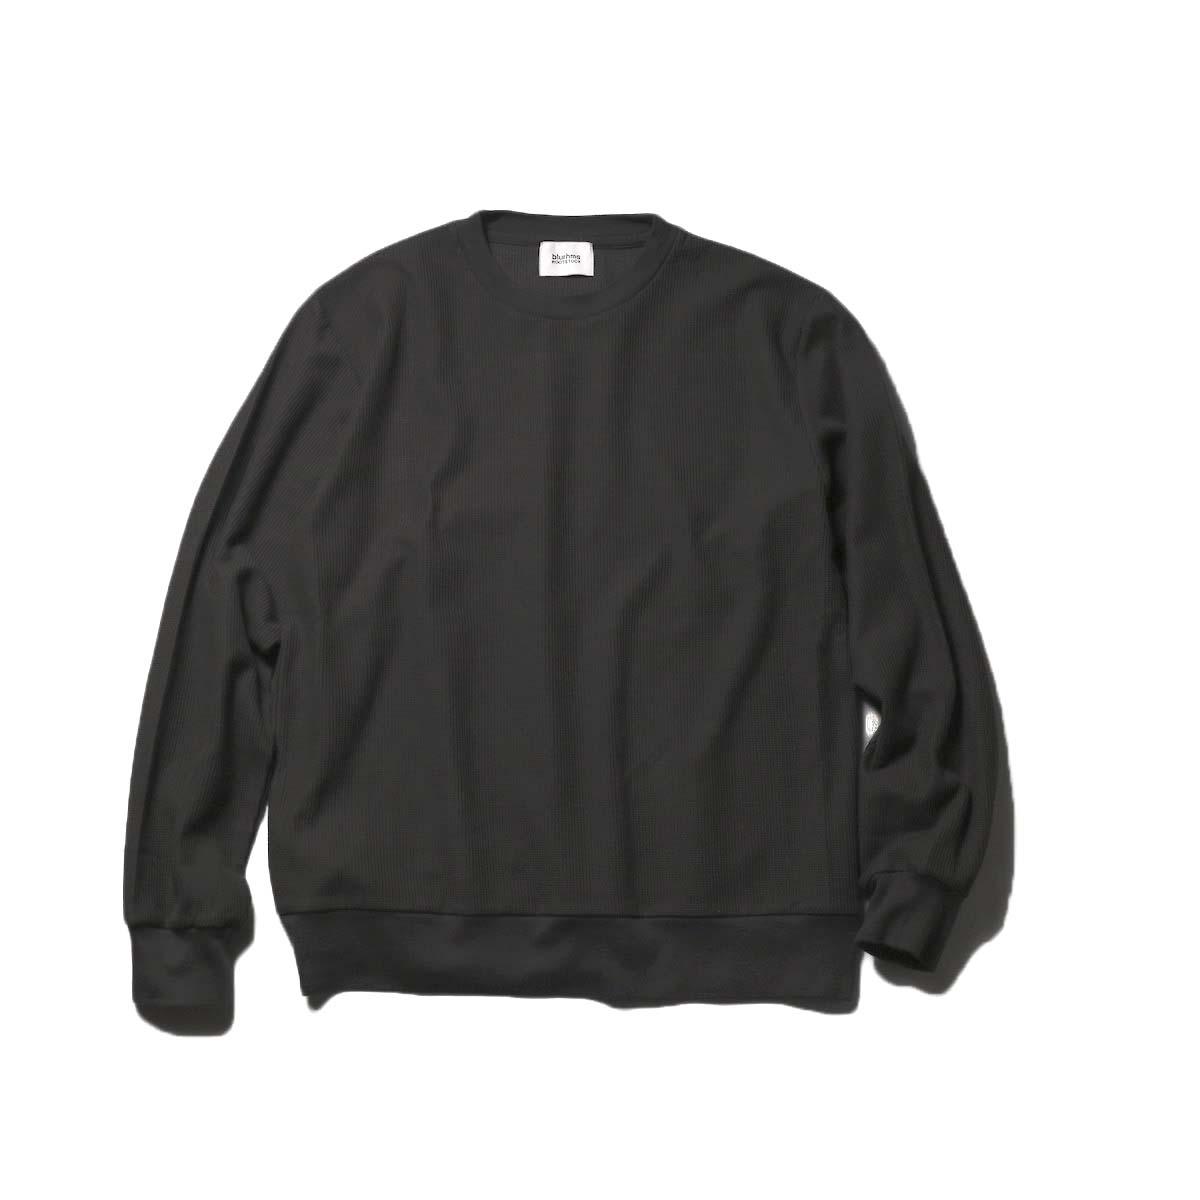 blurhms / New Rough & Smooth Thermal P/O Regular Fit (Black)